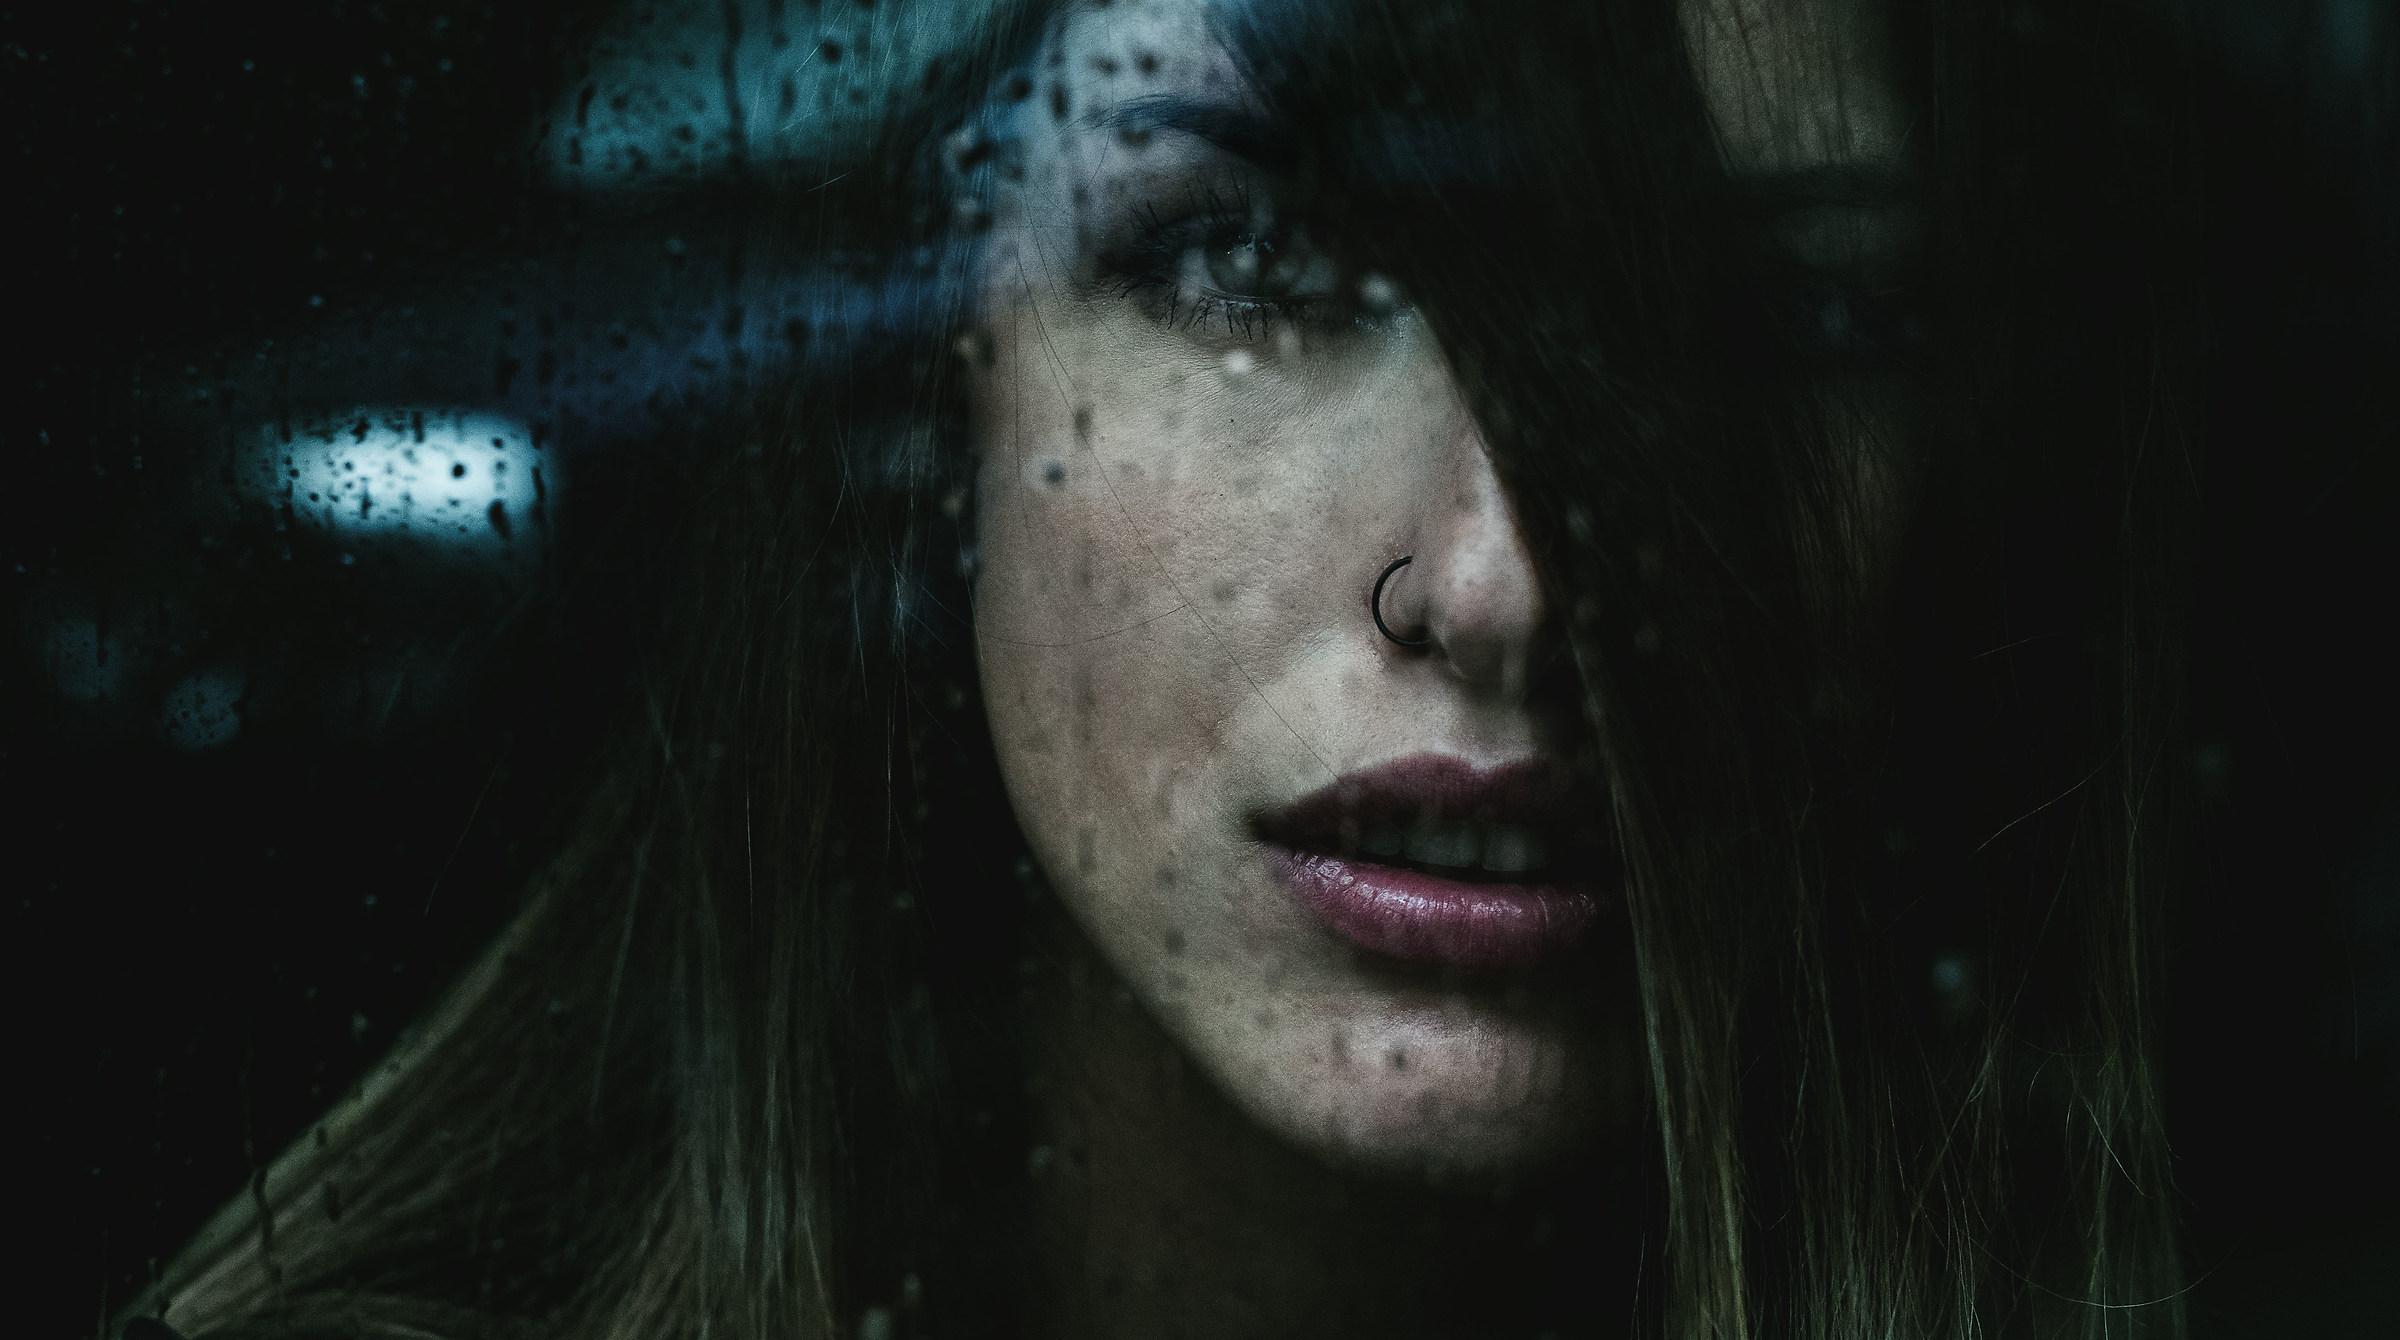 Rain........emotional portrait...